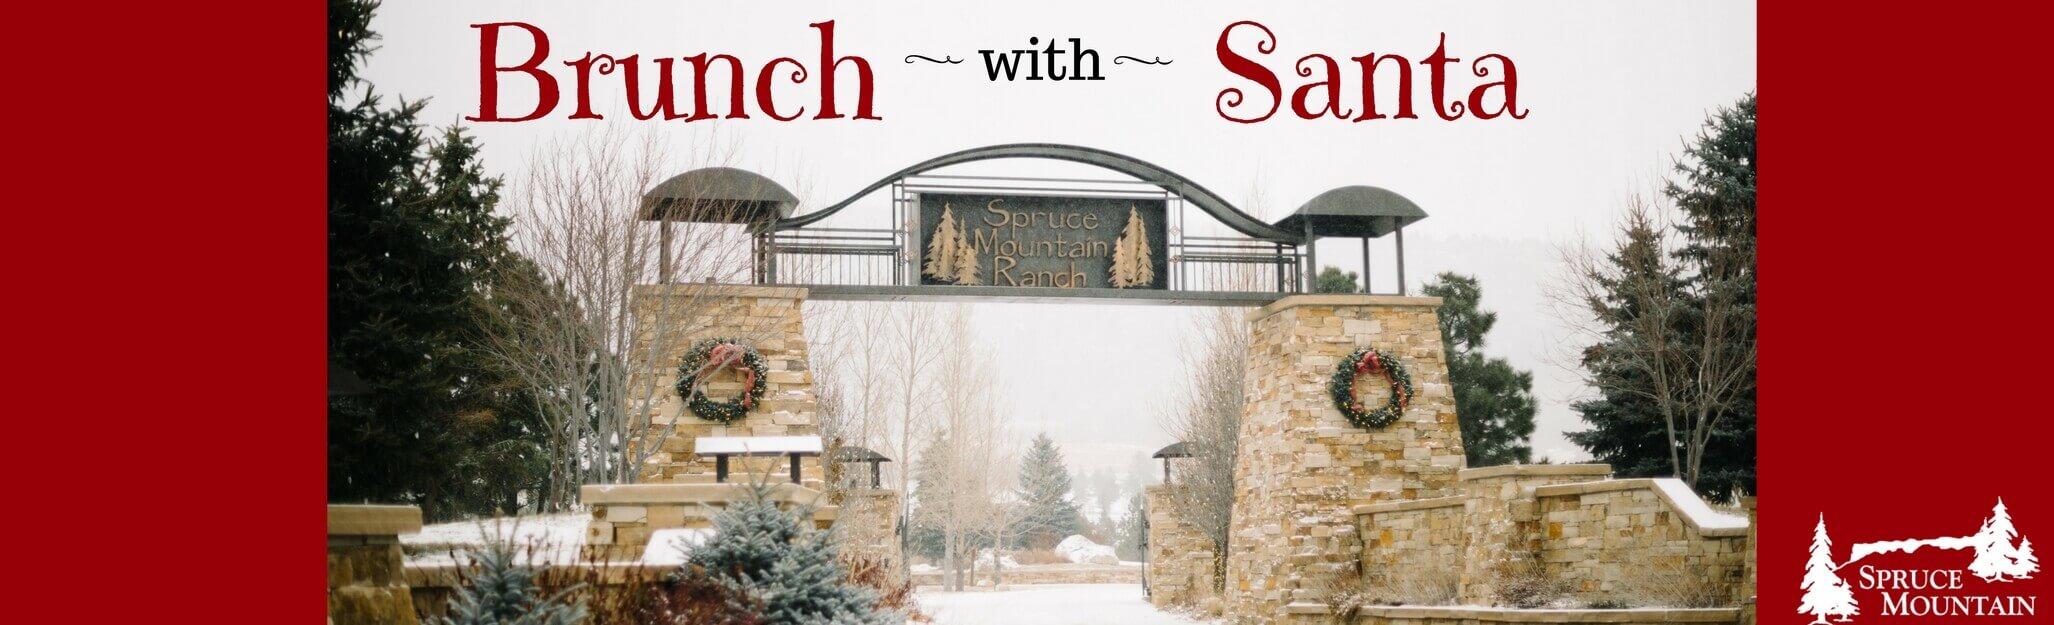 Santa Brunch at Spruce Mountain Ranch